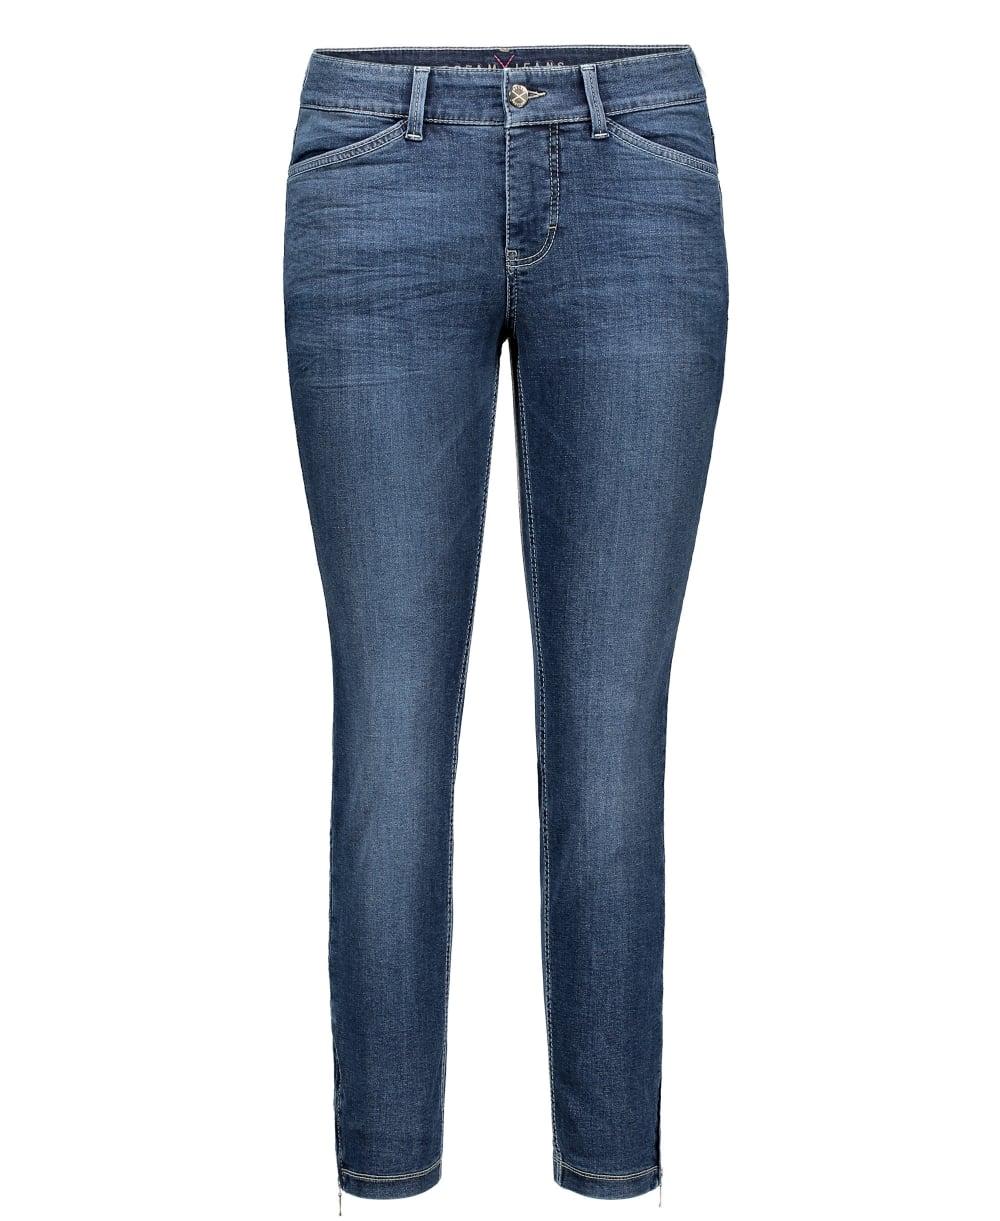 c545cd8e8ba272 MAC Dream Chic Cropped Jean - Jeans from luxury-legs.com UK